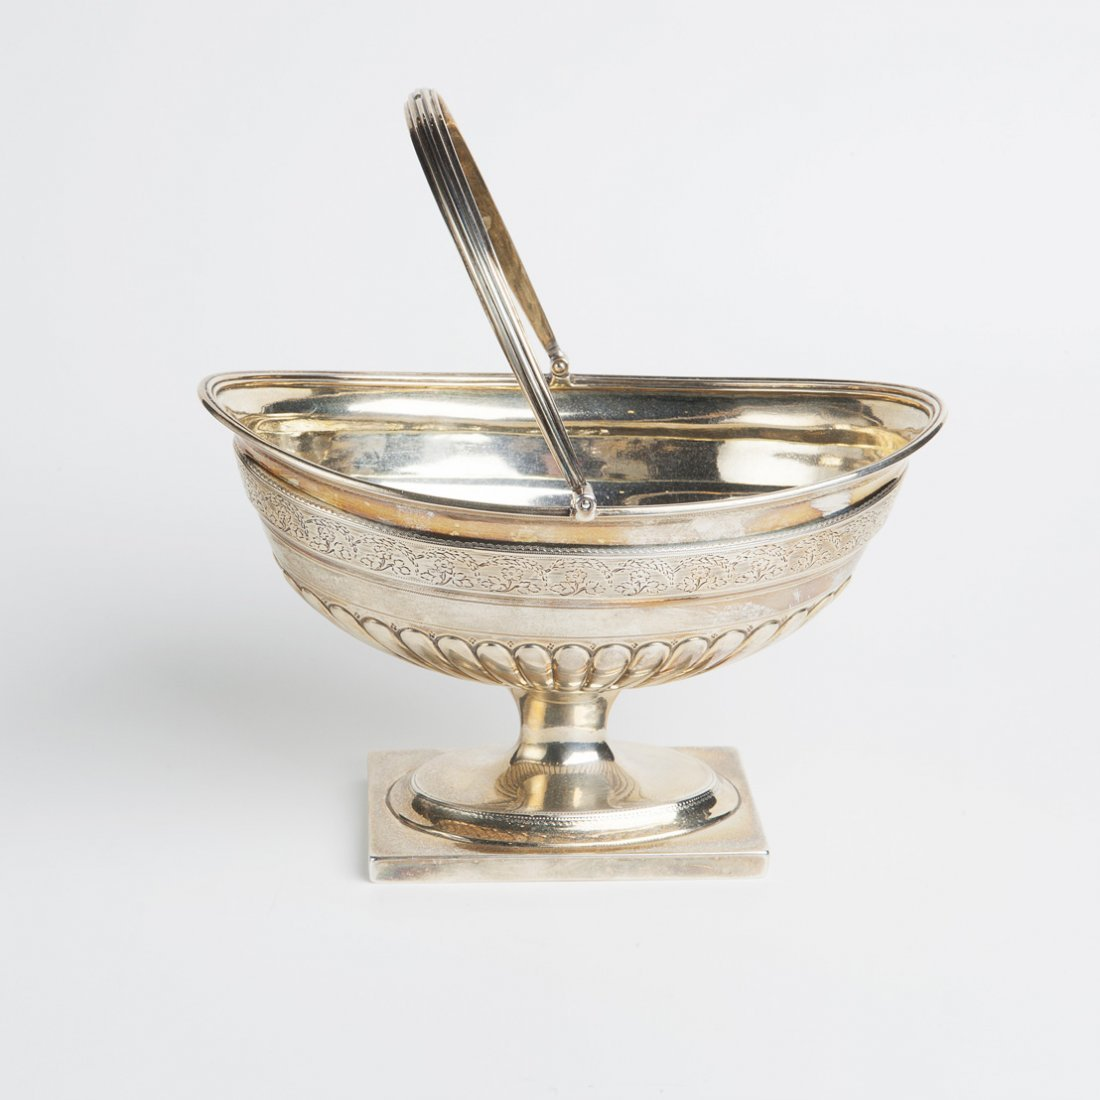 Vasetto ovale in argento 925, Londra 1796